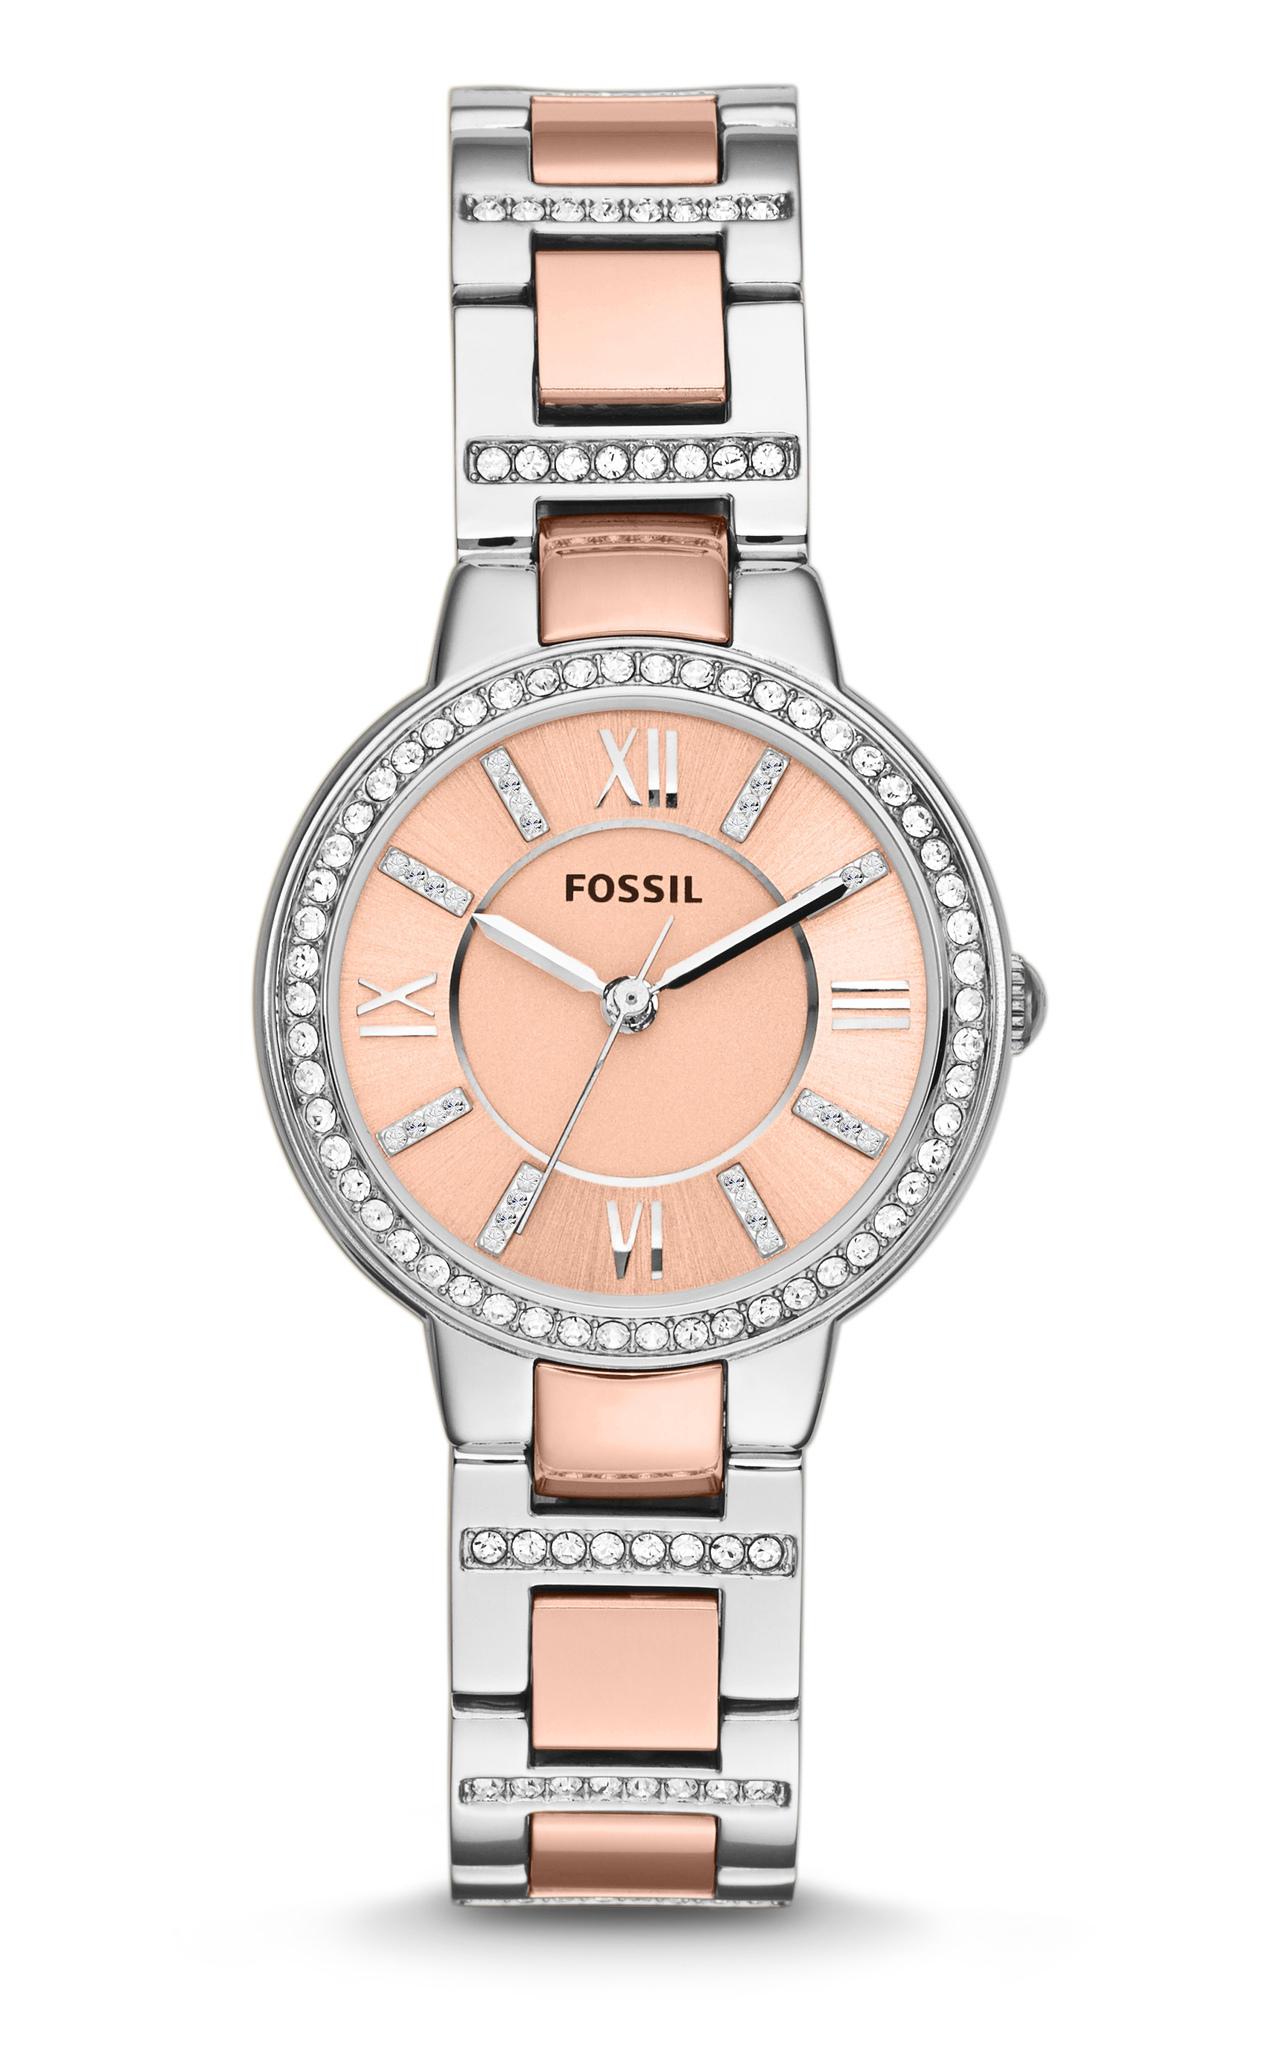 Fossil ES3405 - женские наручные часы из коллекции VirginiaFossil<br><br><br>Бренд: Fossil<br>Модель: Fossil ES3405<br>Артикул: ES3405<br>Вариант артикула: None<br>Коллекция: Virginia<br>Подколлекция: None<br>Страна: США<br>Пол: женские<br>Тип механизма: кварцевые<br>Механизм: None<br>Количество камней: None<br>Автоподзавод: None<br>Источник энергии: от батарейки<br>Срок службы элемента питания: None<br>Дисплей: стрелки<br>Цифры: римские<br>Водозащита: WR 50<br>Противоударные: None<br>Материал корпуса: нерж. сталь<br>Материал браслета: нерж. сталь, PVD покрытие (частичное): позолота<br>Материал безеля: None<br>Стекло: минеральное<br>Антибликовое покрытие: None<br>Цвет корпуса: None<br>Цвет браслета: None<br>Цвет циферблата: None<br>Цвет безеля: None<br>Размеры: 30x9 мм<br>Диаметр: None<br>Диаметр корпуса: None<br>Толщина: None<br>Ширина ремешка: None<br>Вес: None<br>Спорт-функции: None<br>Подсветка: None<br>Вставка: None<br>Отображение даты: None<br>Хронограф: None<br>Таймер: None<br>Термометр: None<br>Хронометр: None<br>GPS: None<br>Радиосинхронизация: None<br>Барометр: None<br>Скелетон: None<br>Дополнительная информация: None<br>Дополнительные функции: None